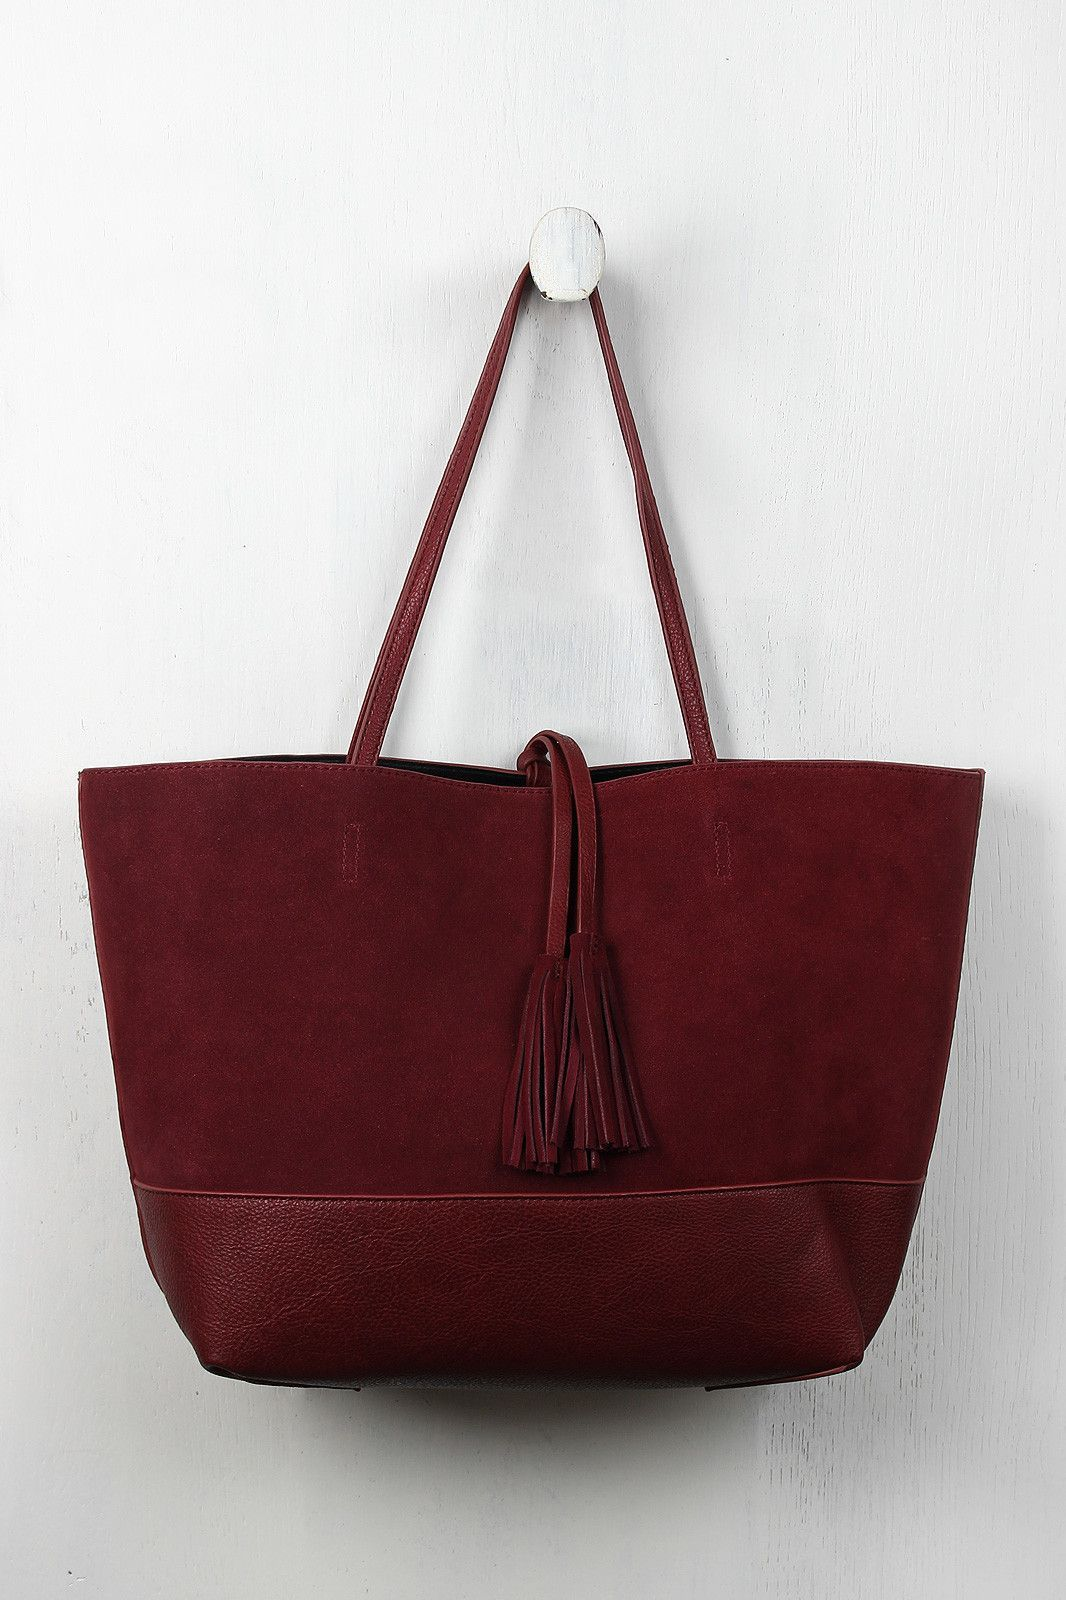 ecc3bd54efa7 Reversible Suede And Leather Tassel Tote Bag